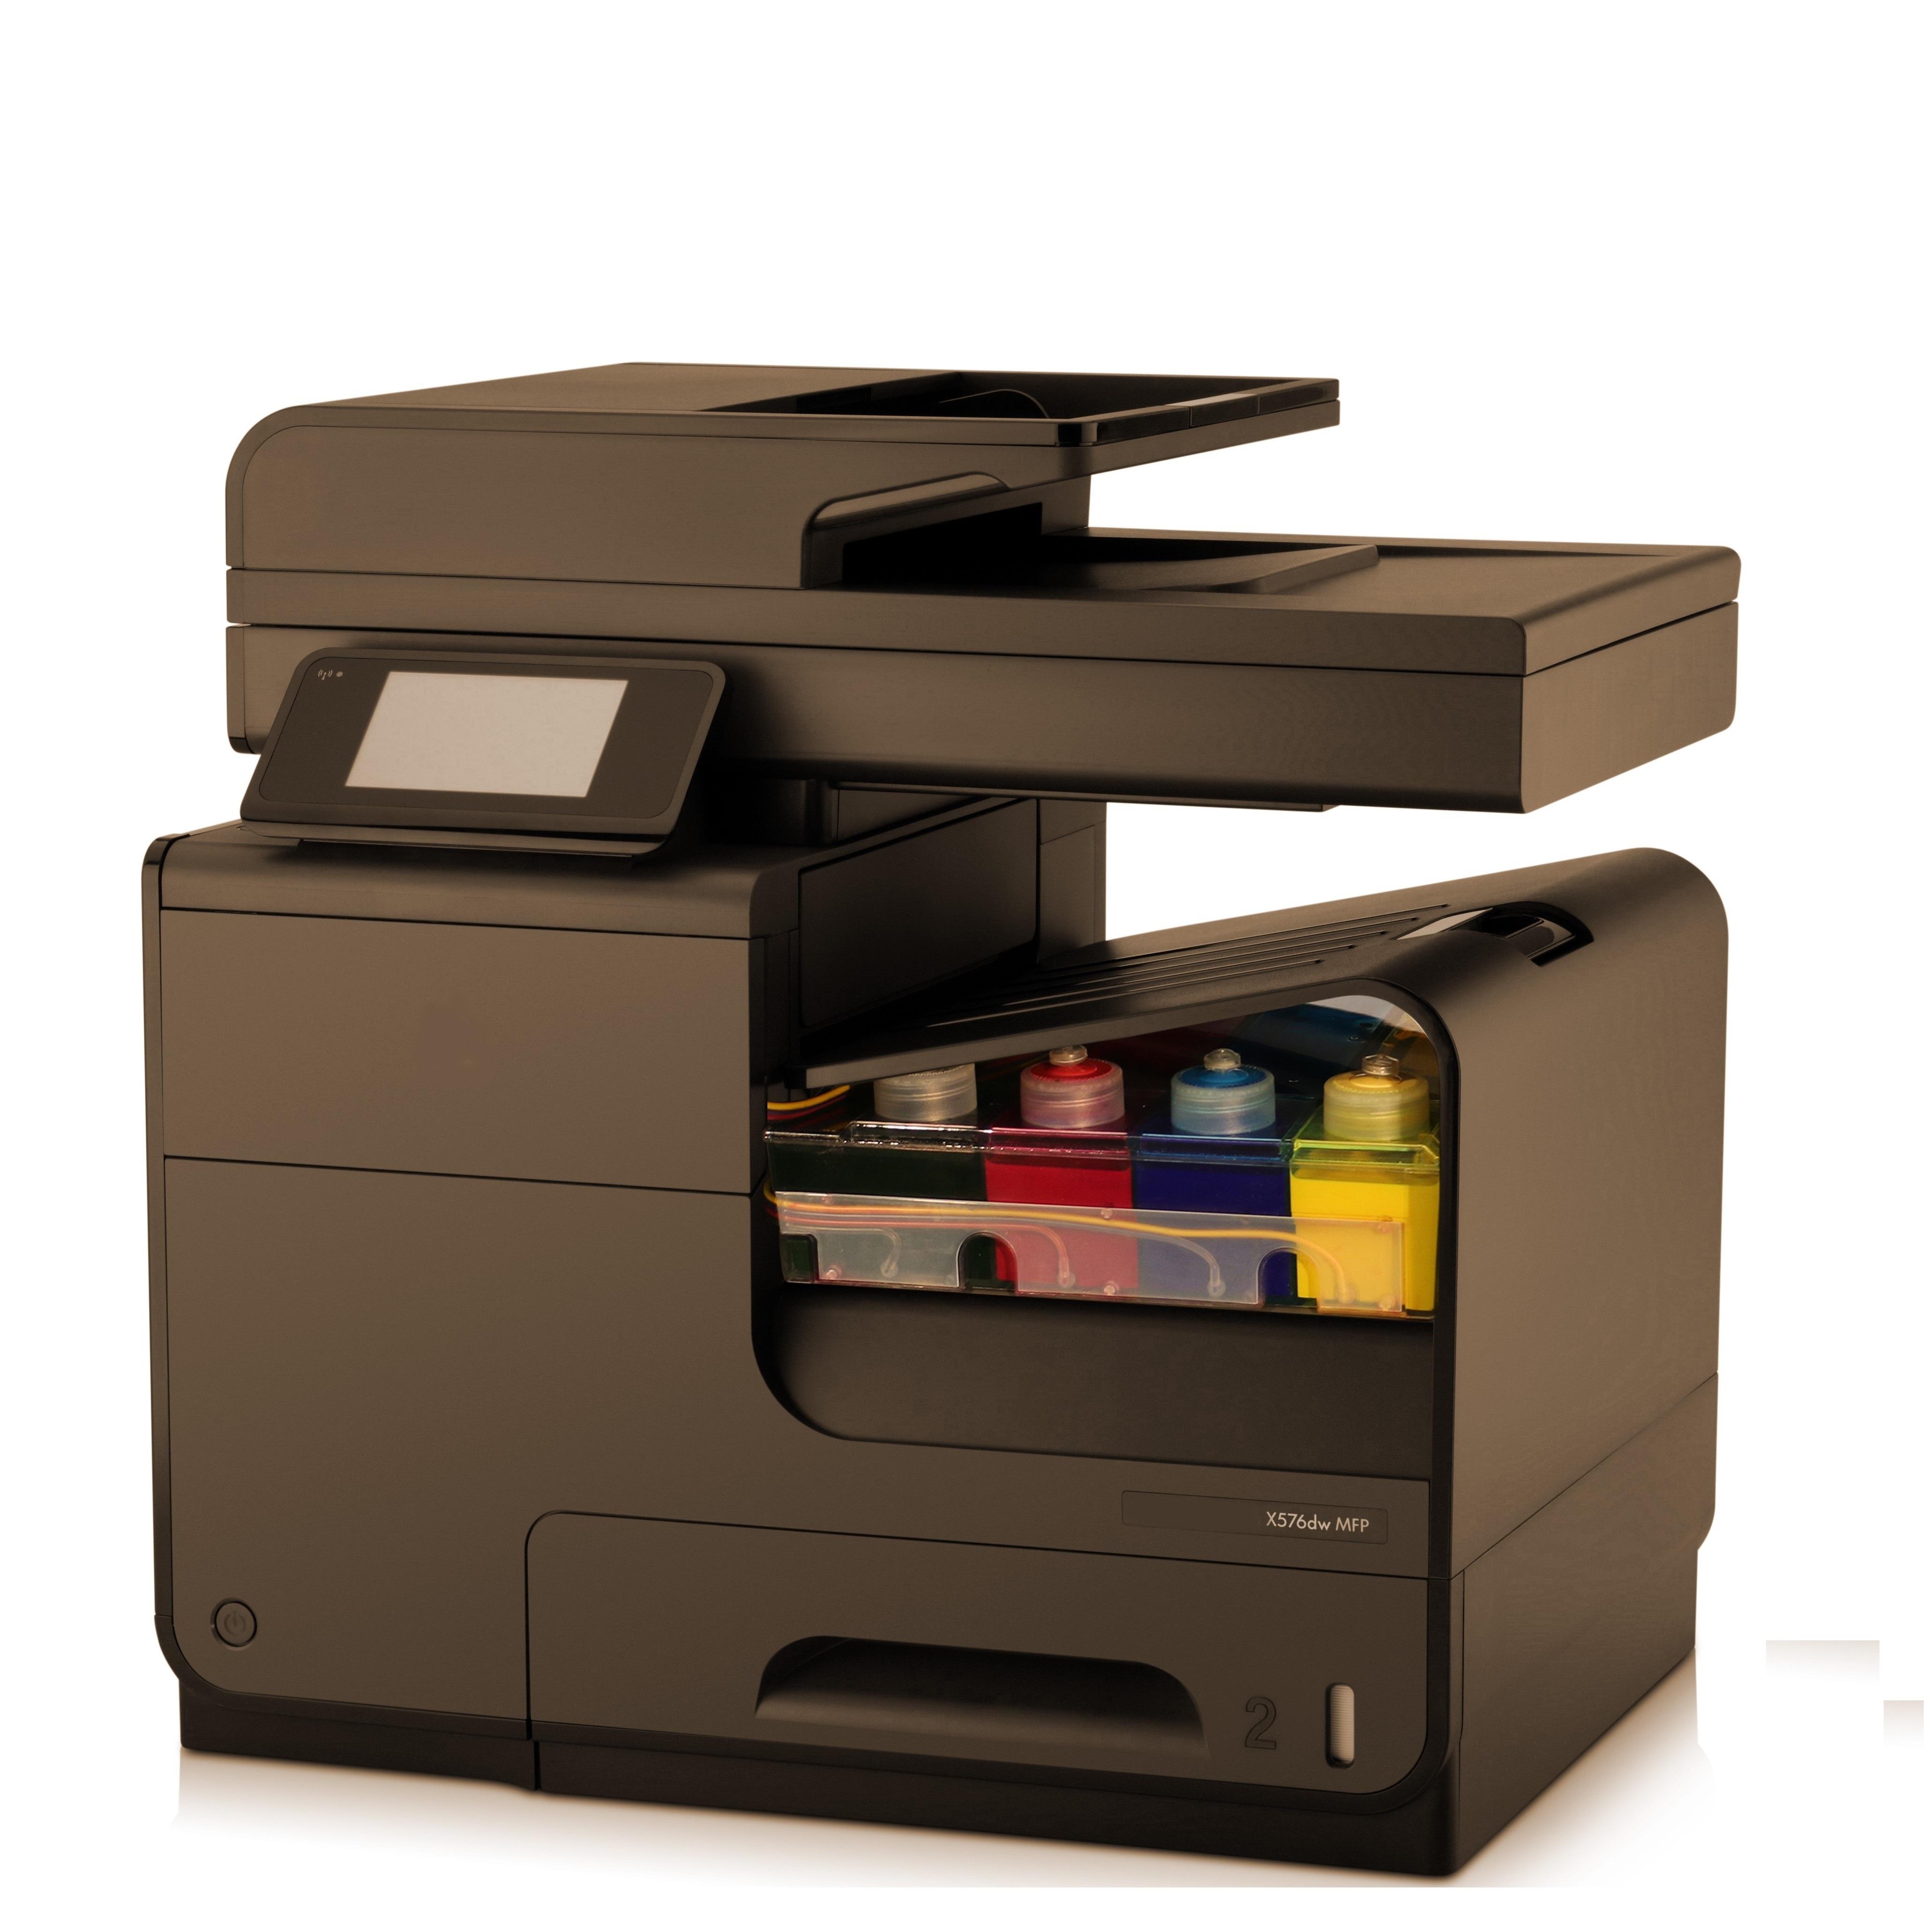 Officejet pro x576dw ink tank system singink for Best home office inkjet printer 2015